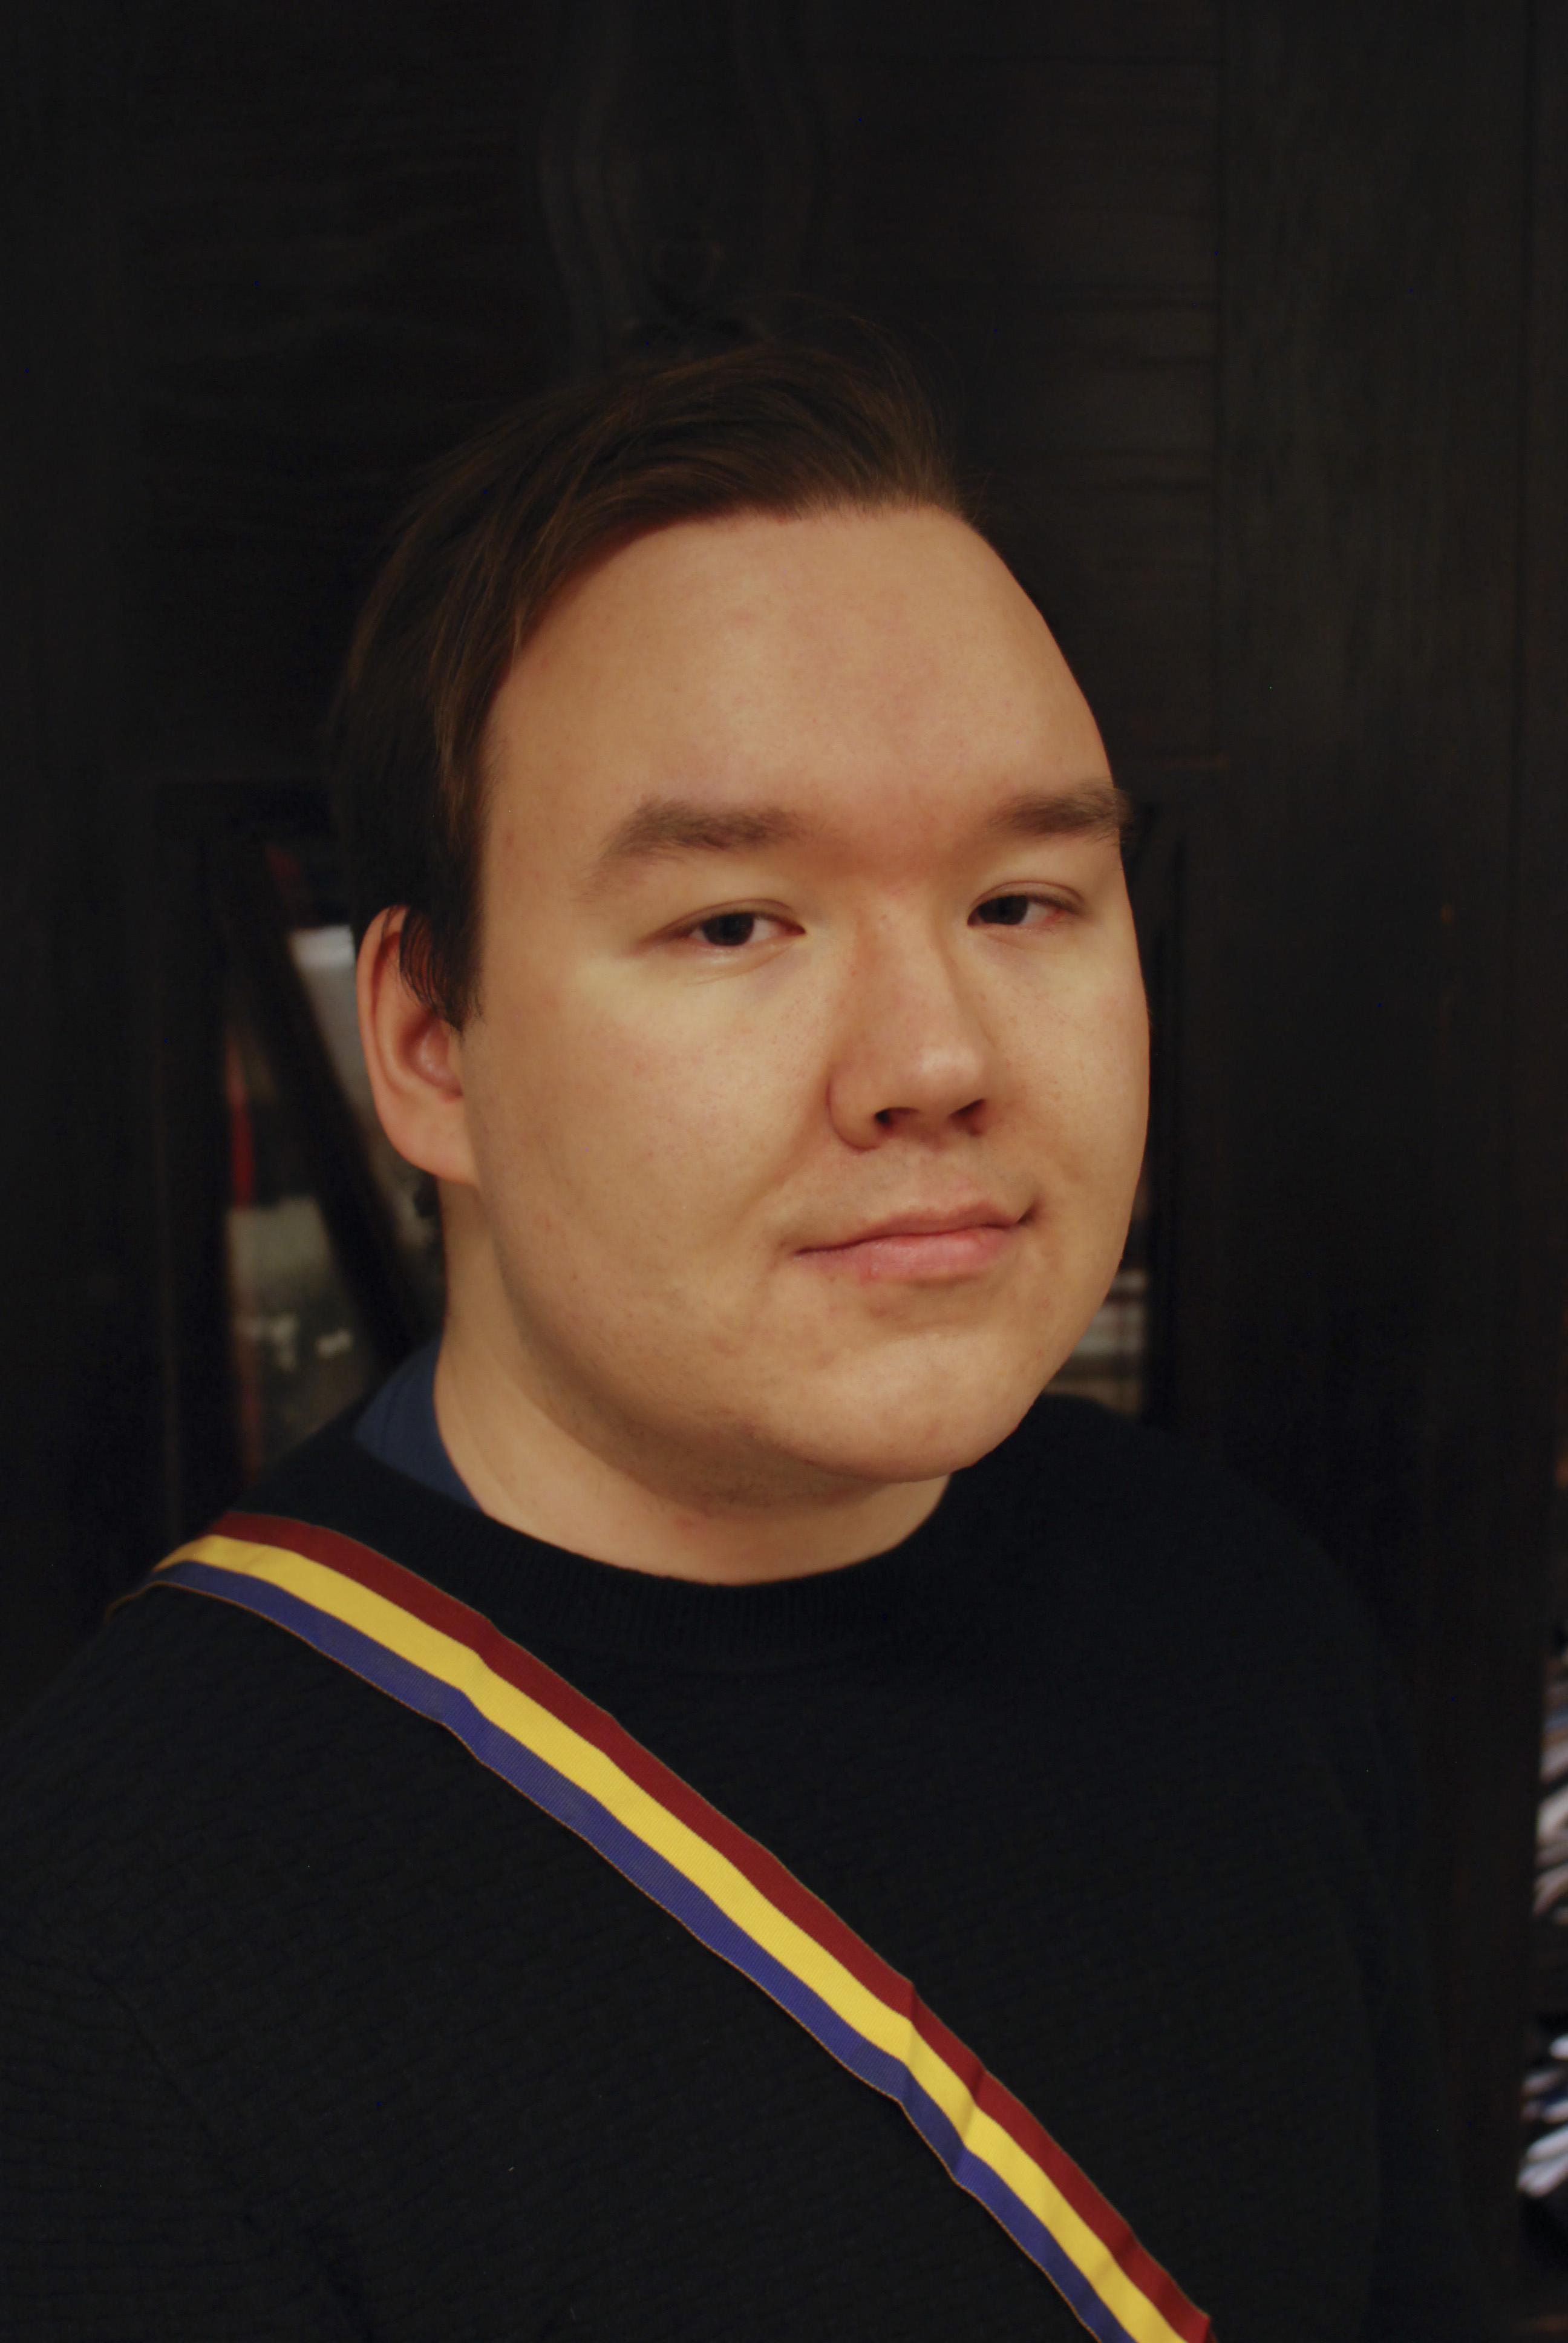 Jaakko Tanhola